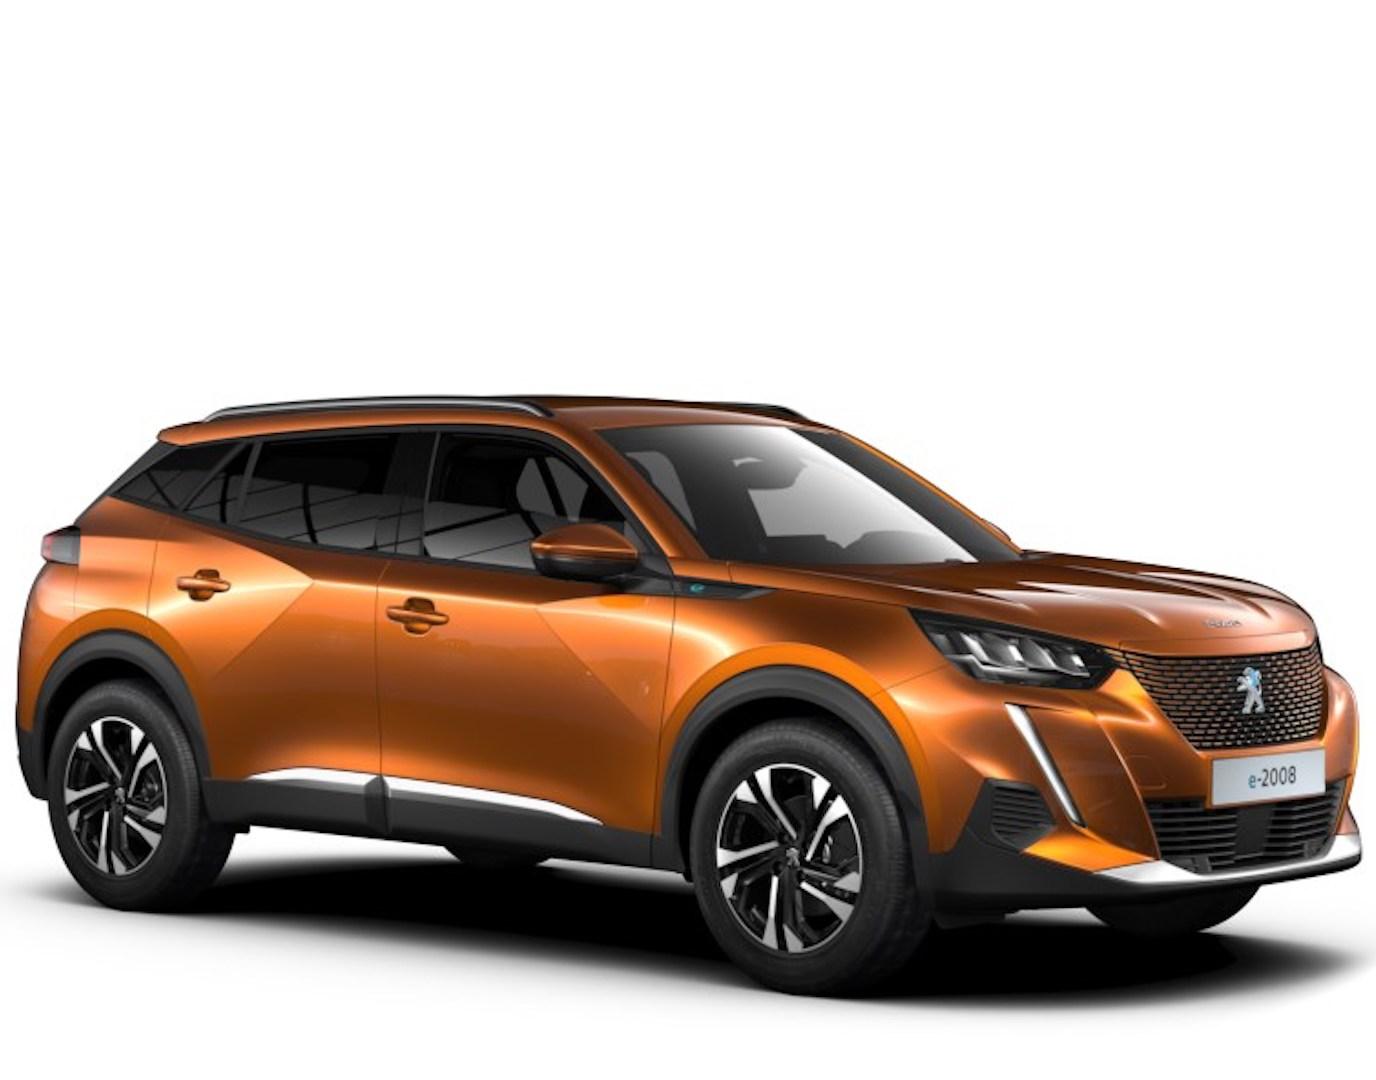 Medidas do Peugeot 2008